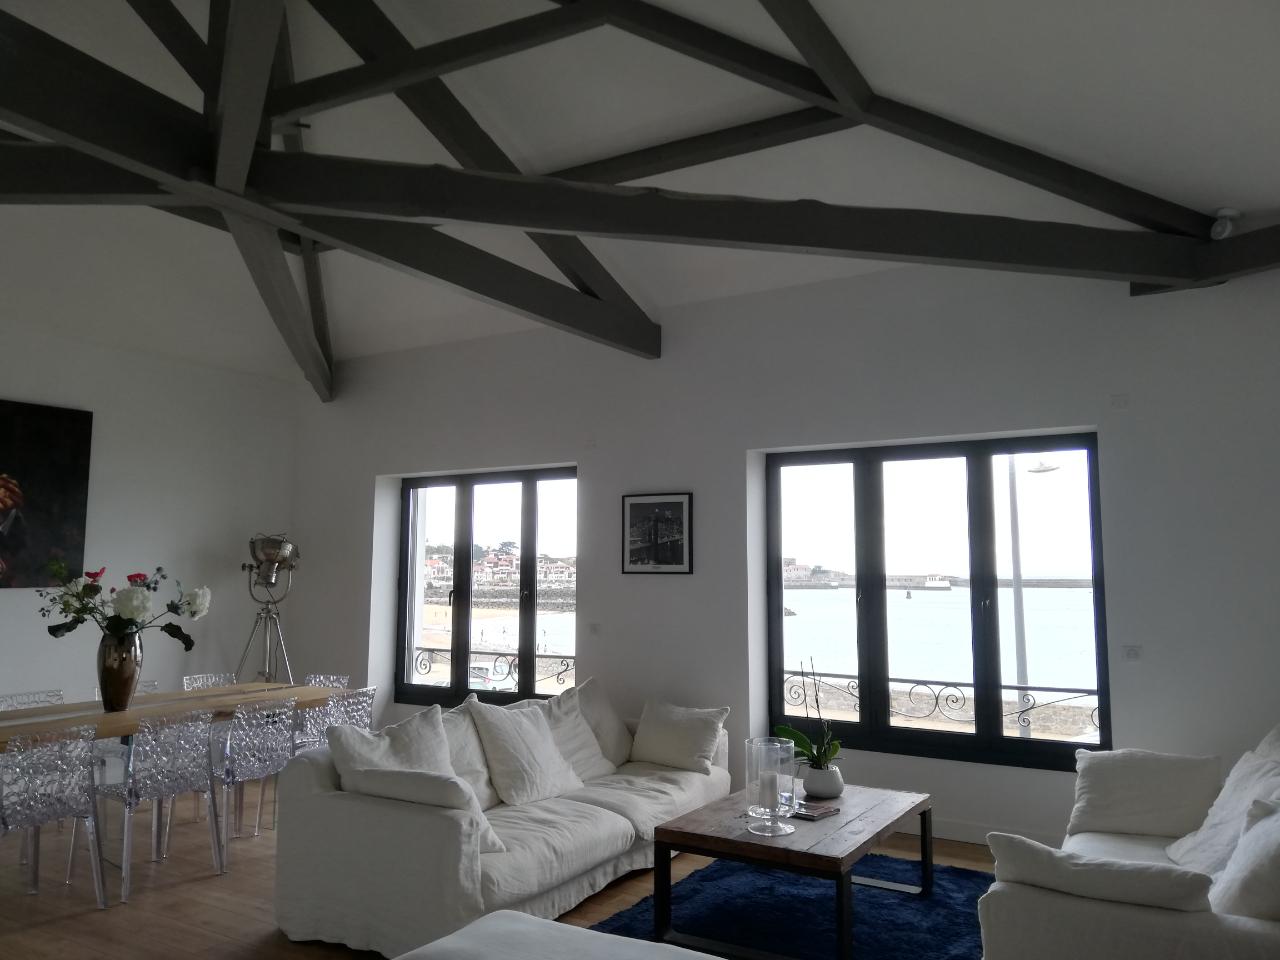 vente appartement à CIBOURE - 1 730 000